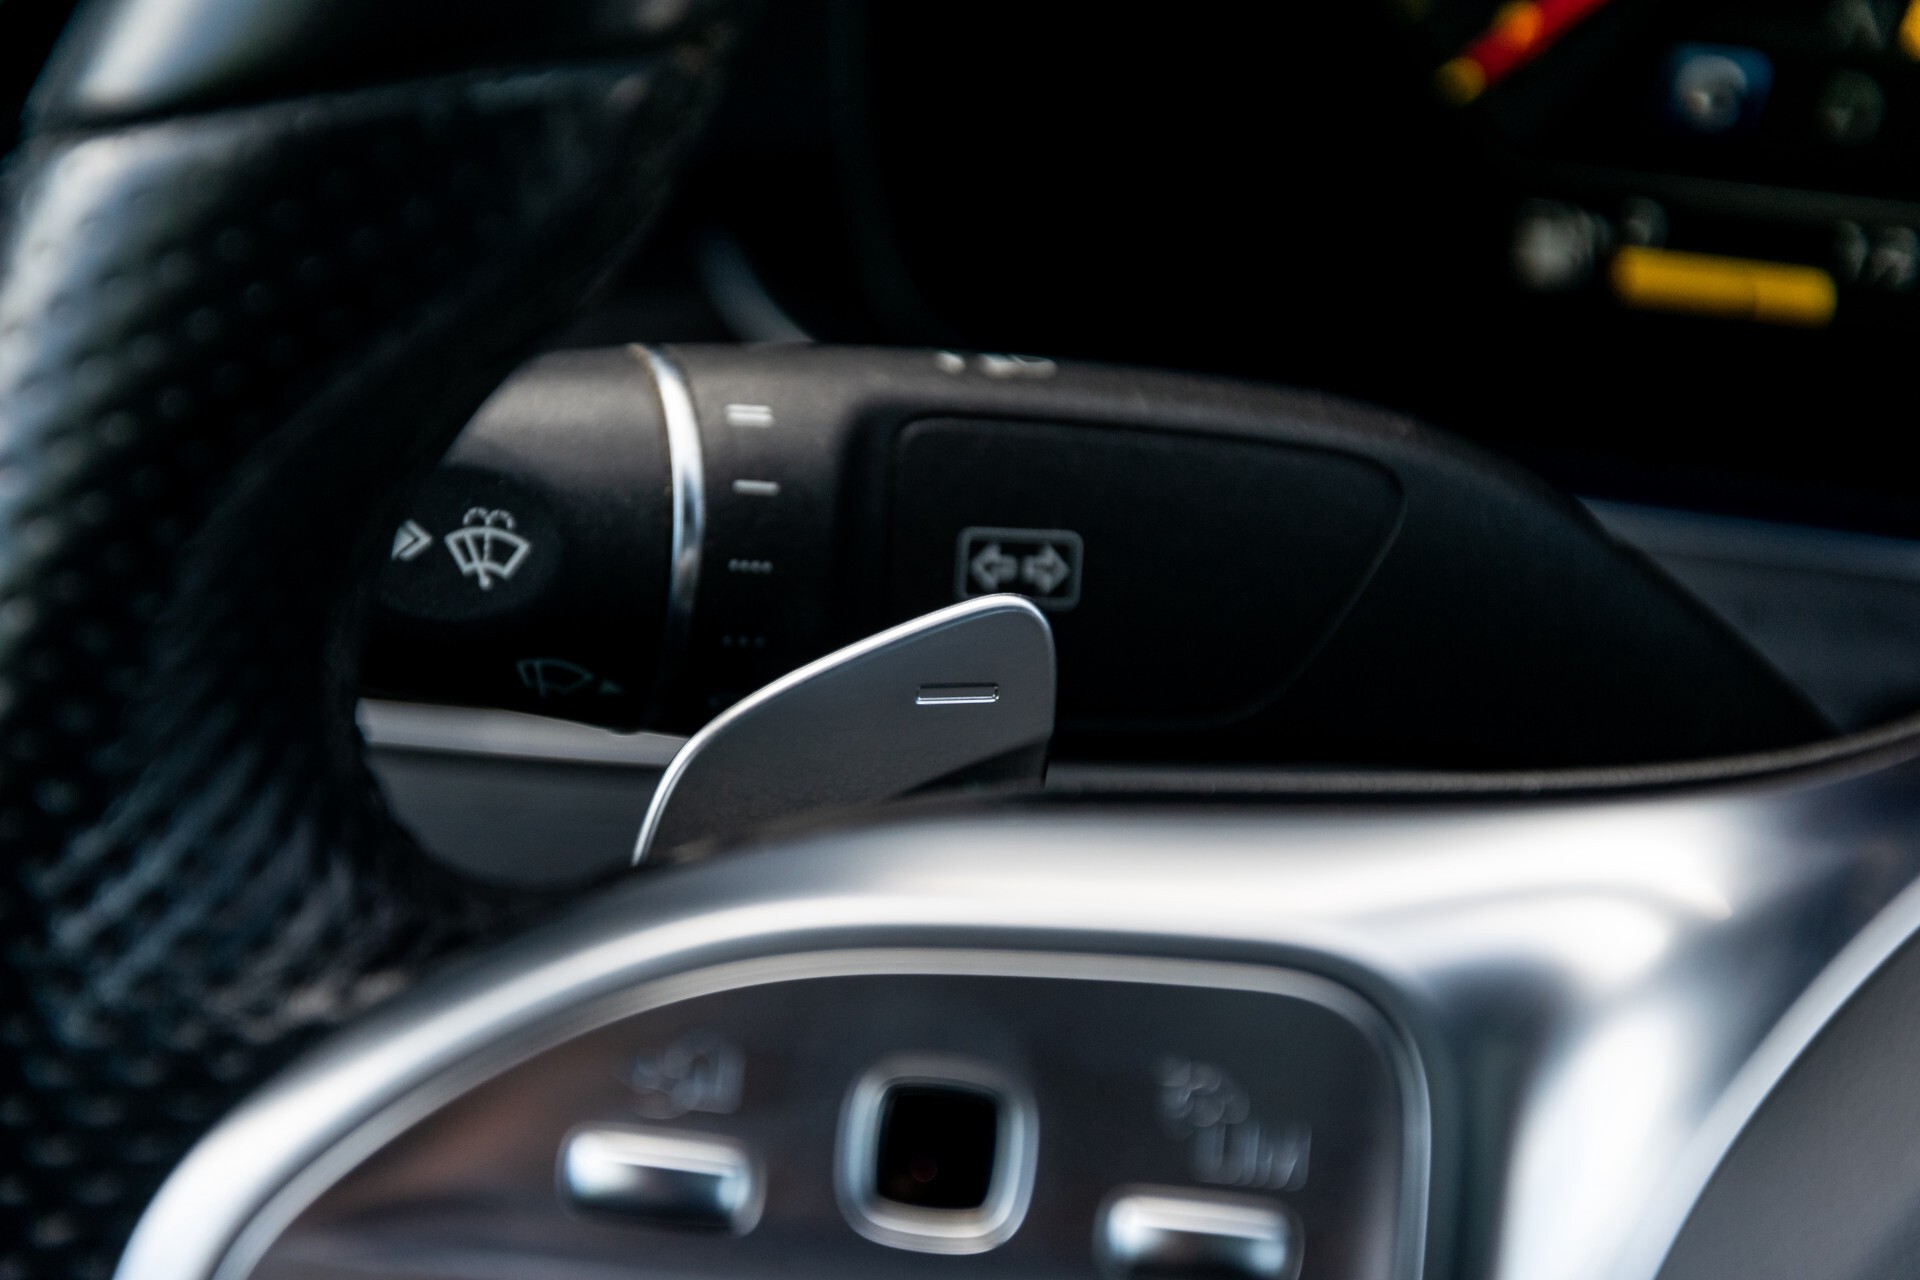 Mercedes-Benz E-Klasse Coupé 300 AMG Panorama/Rij-assist/Keyless/Massage/Memory/HUD/Standkachel/Night Aut9 Foto 12